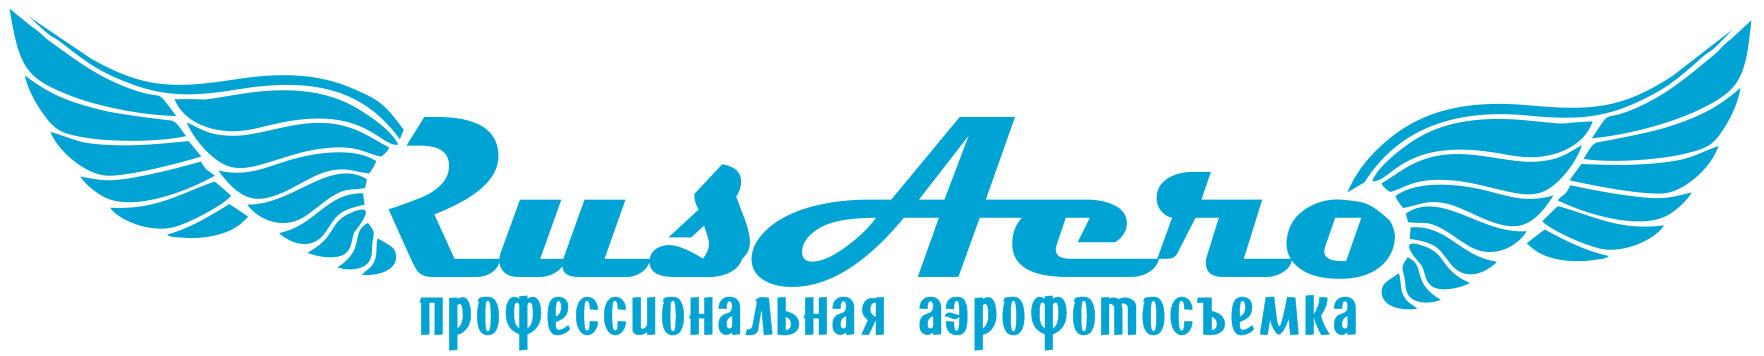 Рус-Аэро - аэросъемка Воронеж